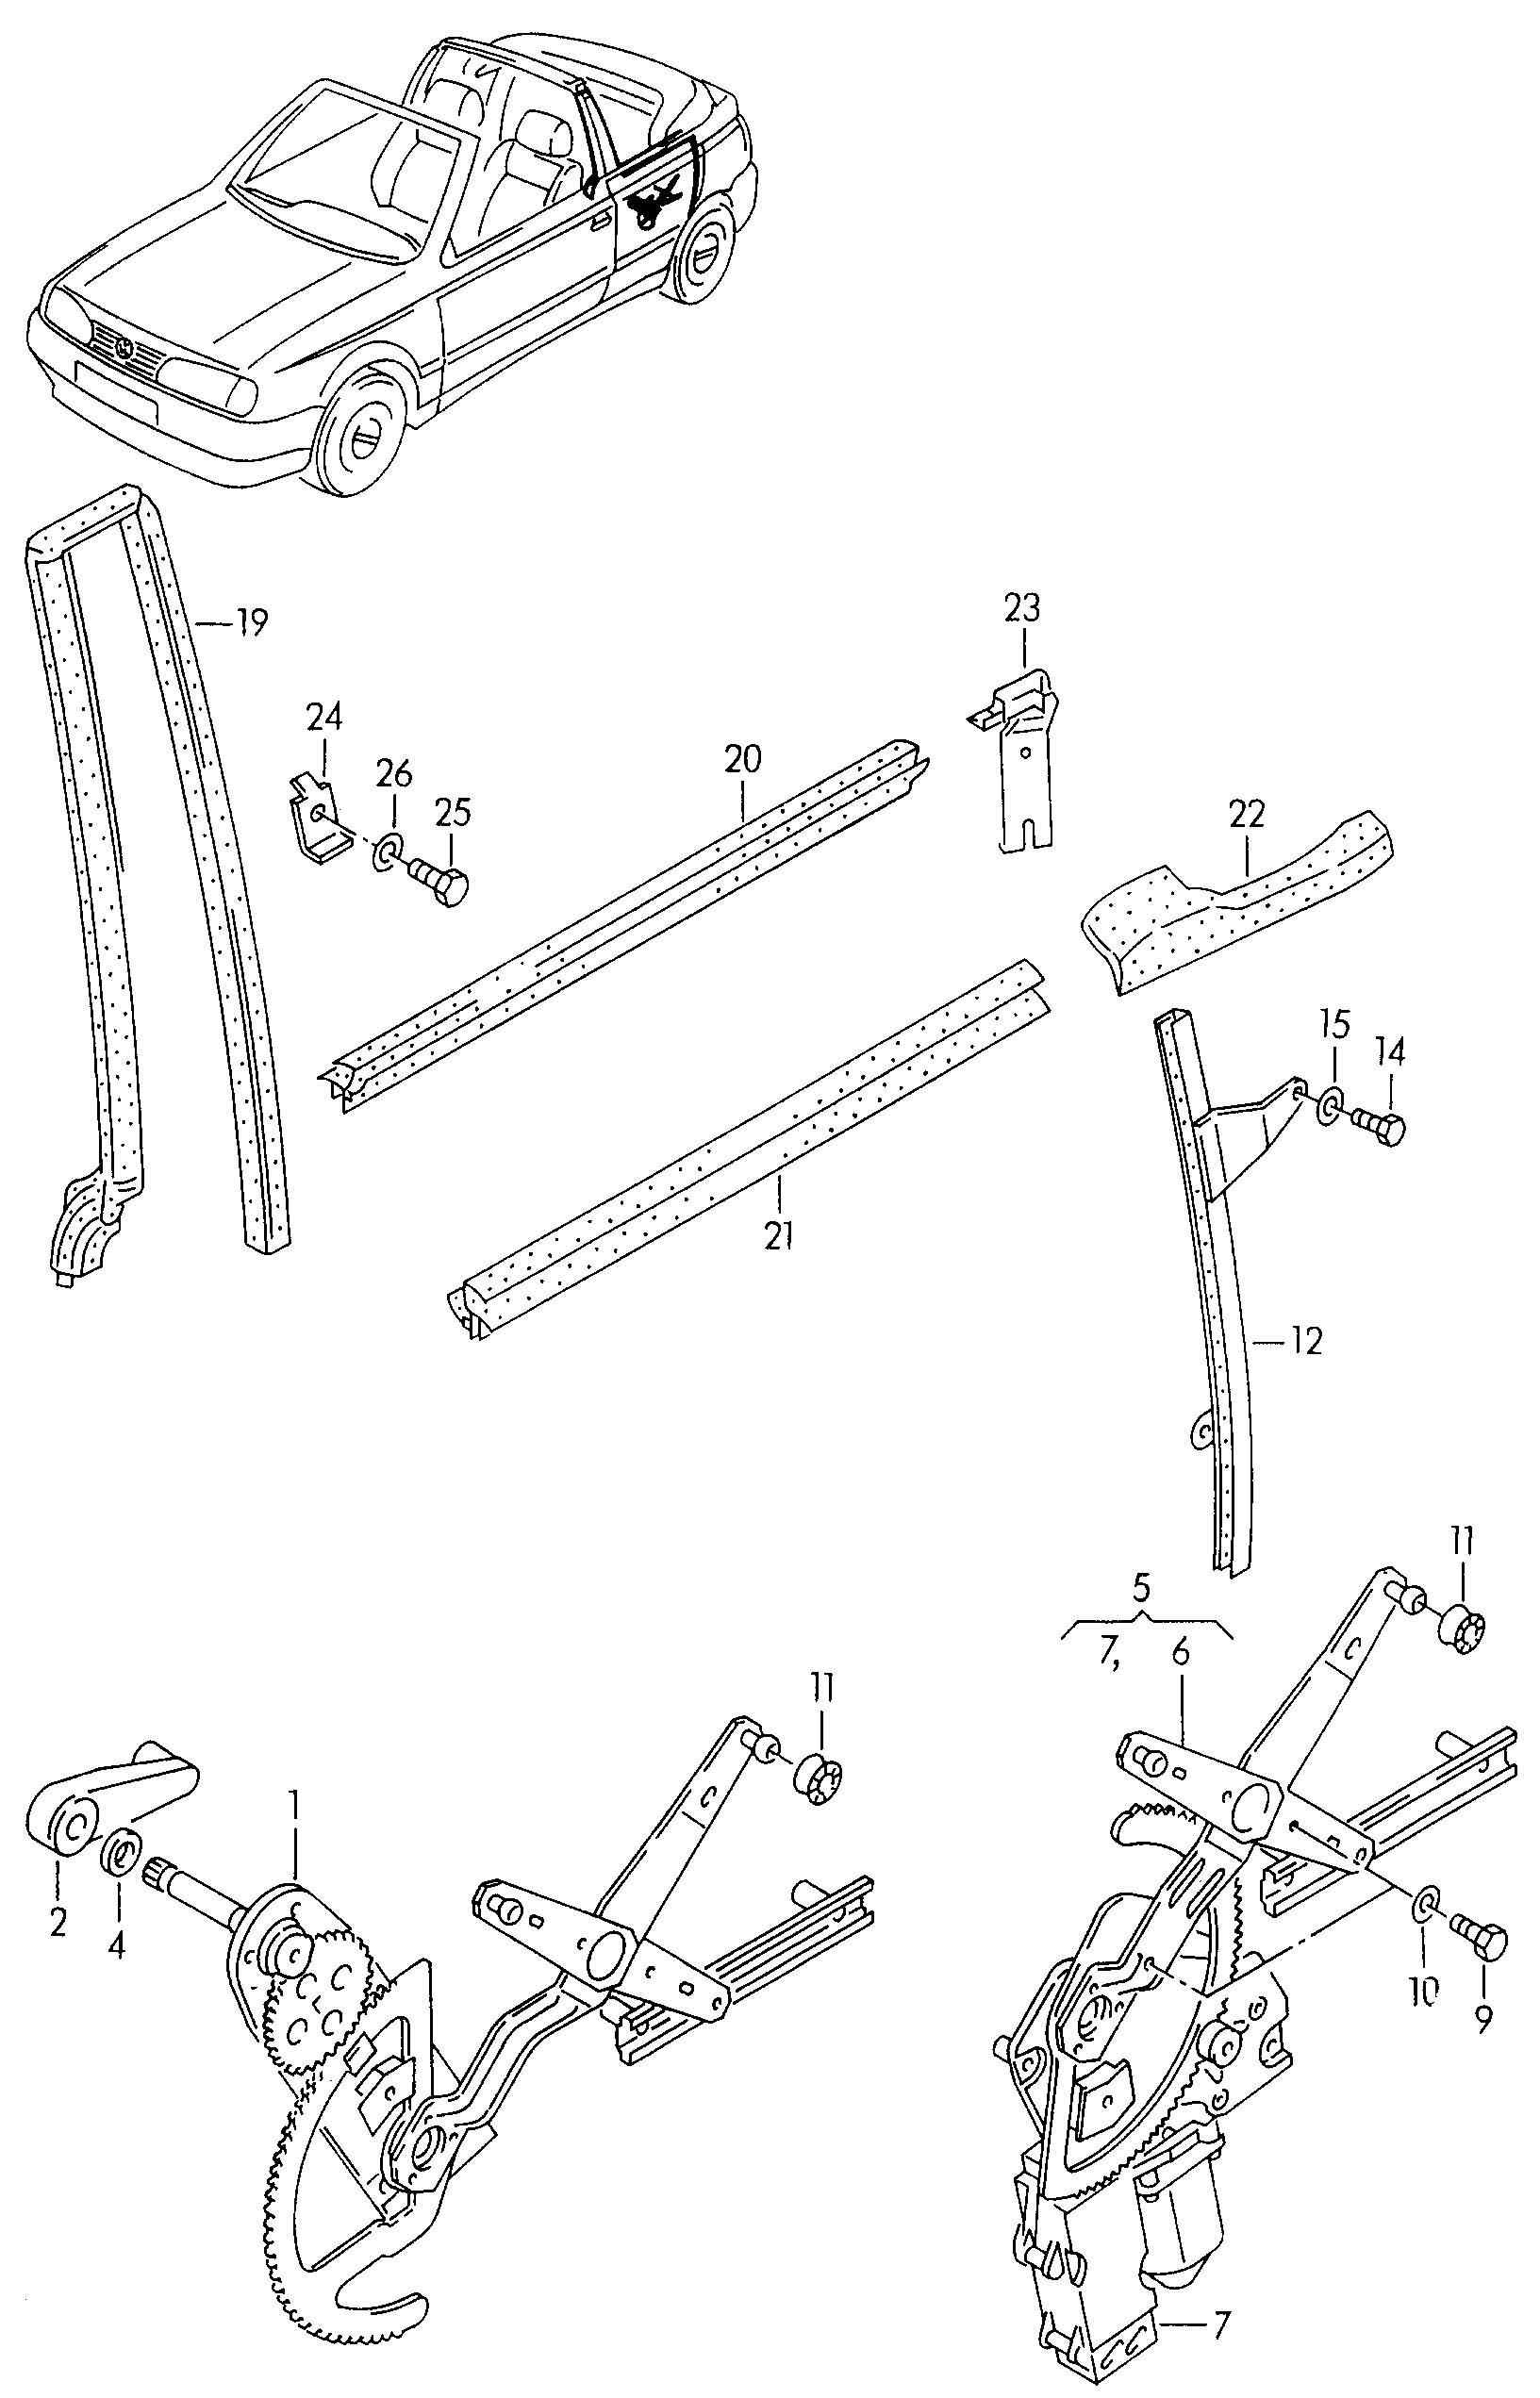 Volkswagen Cabrio Cabriolet Window Regulator Without Motor